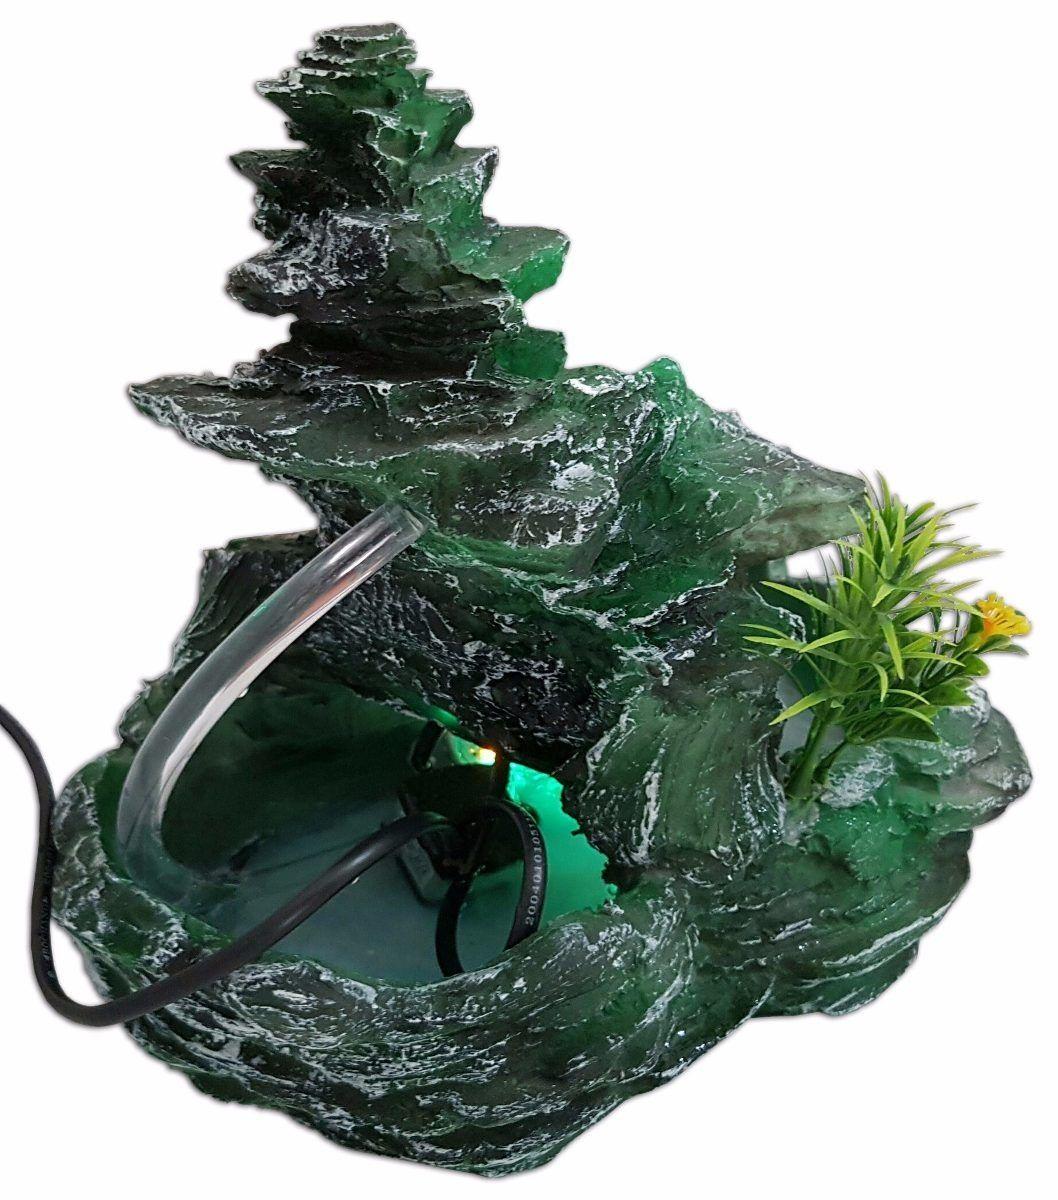 Fonte de água Pedra e Cascata luz e roda da água 110 V